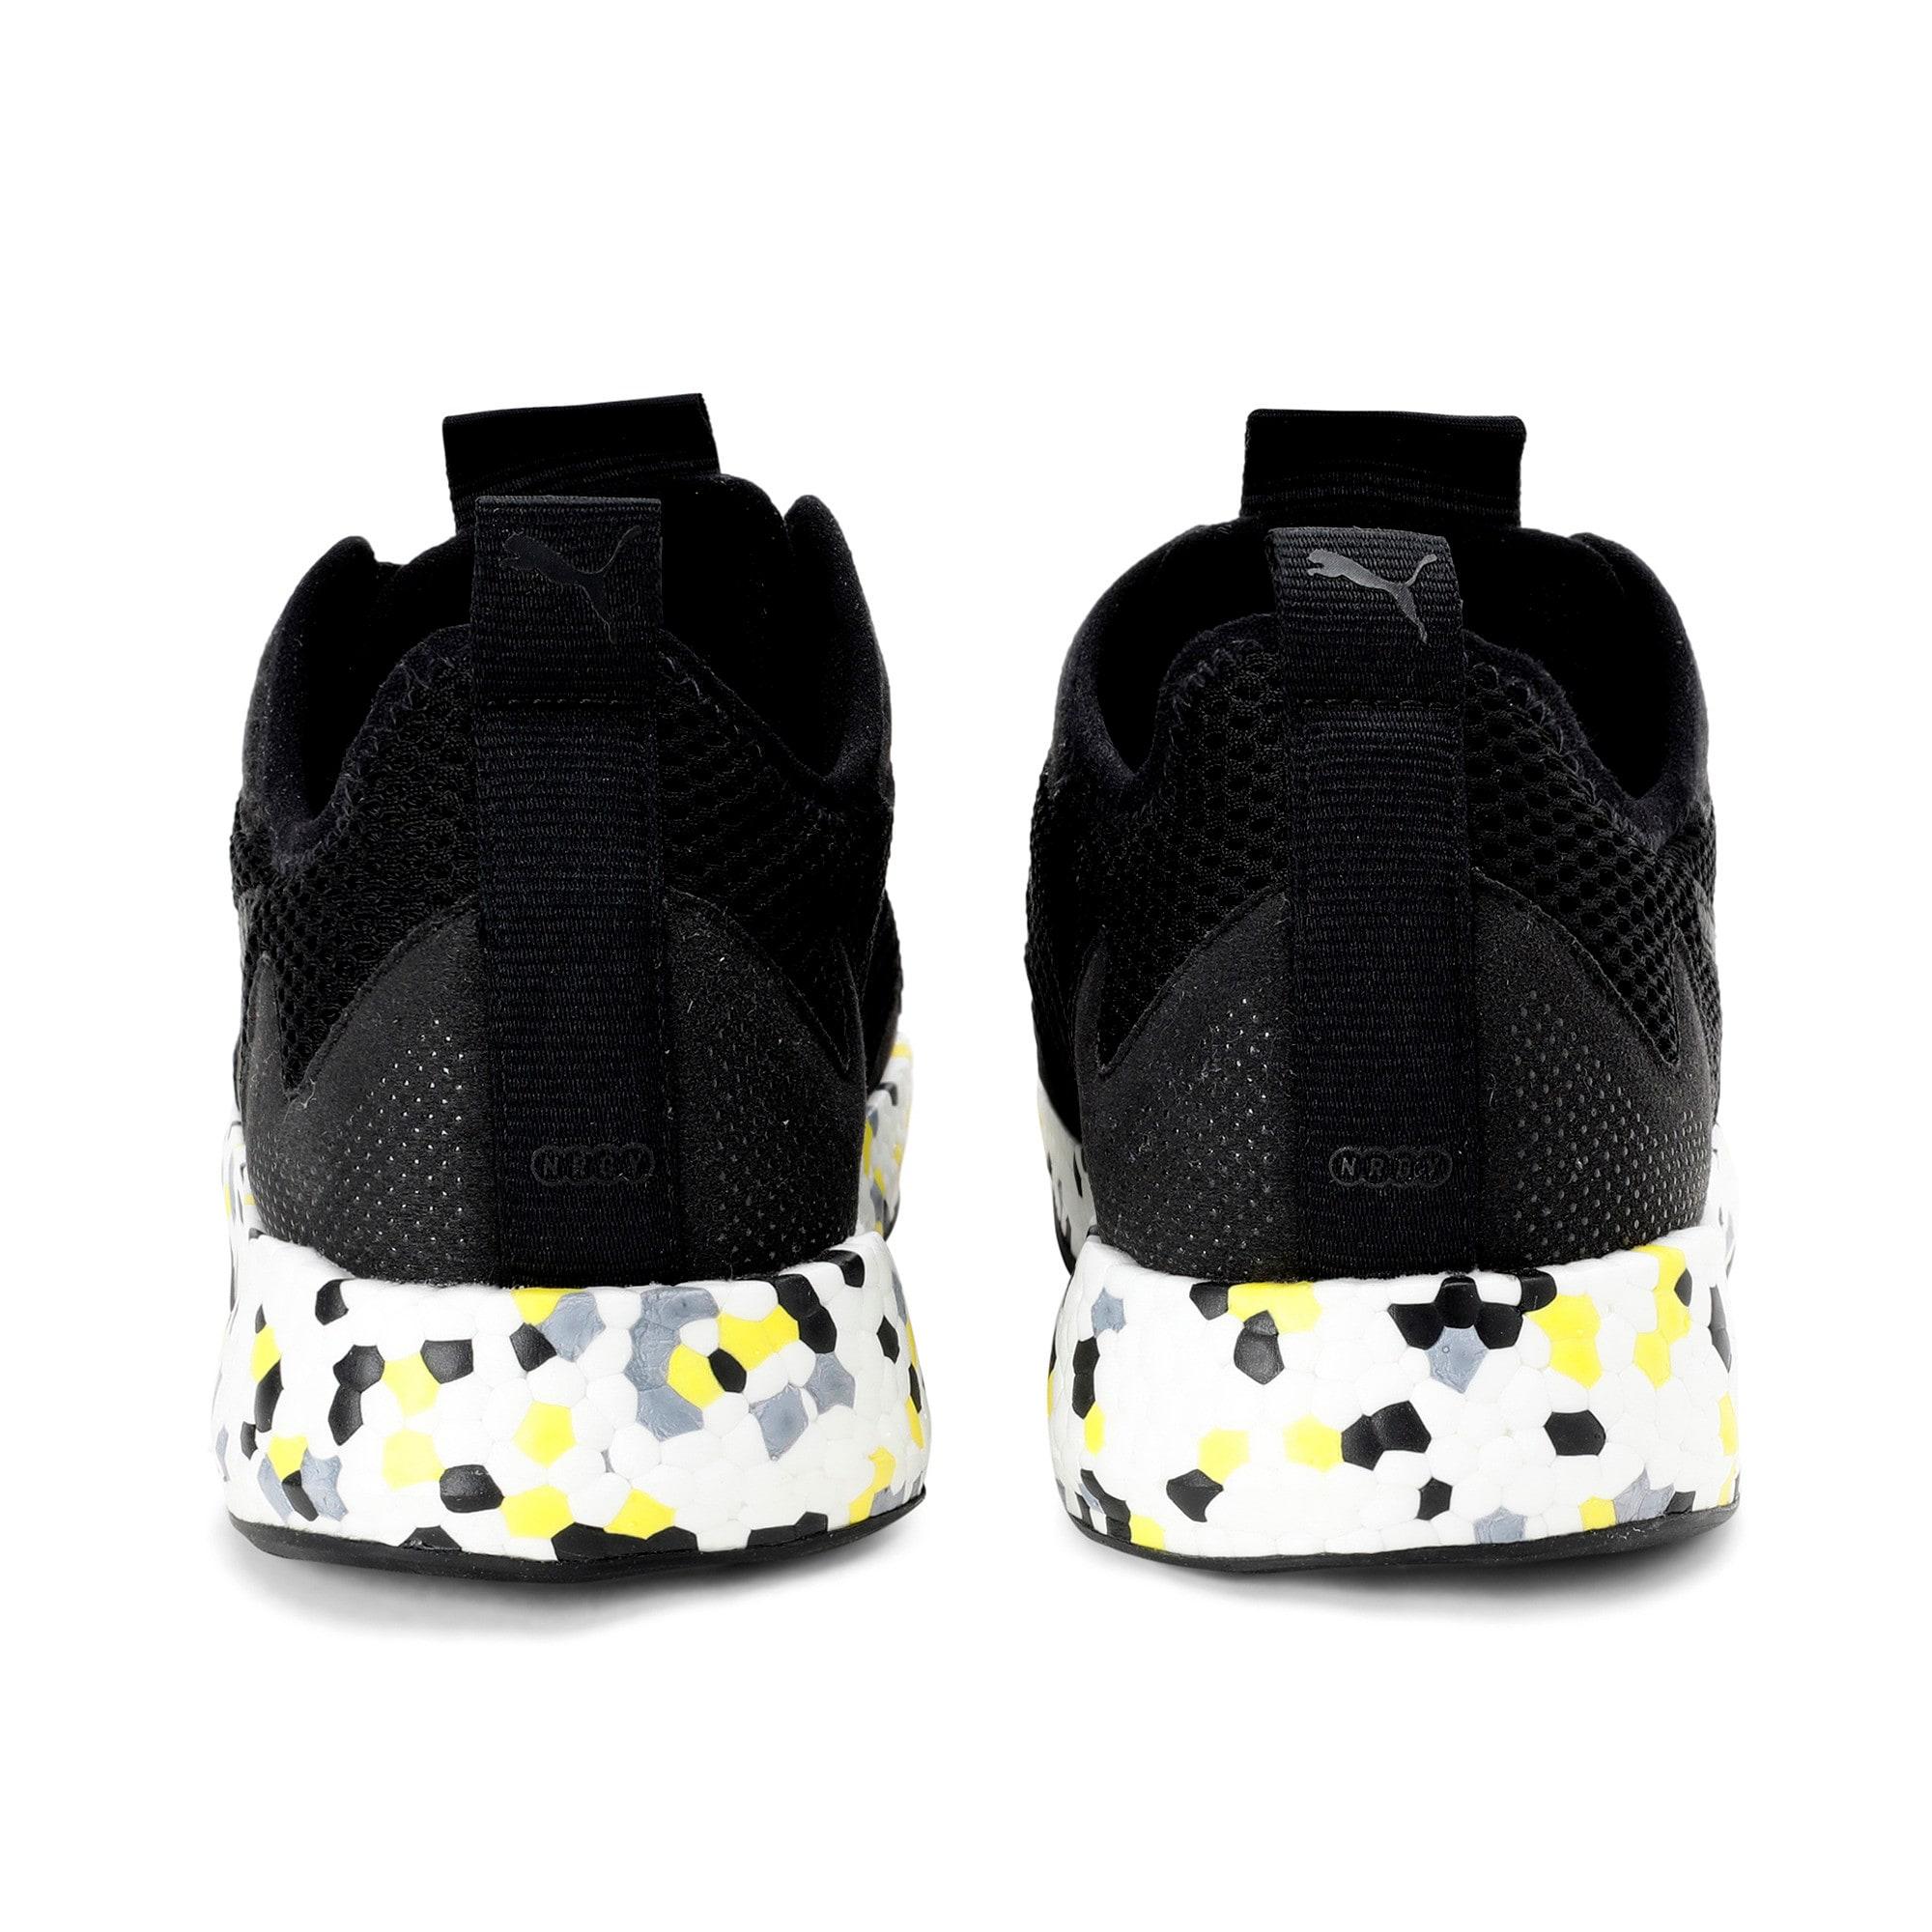 Thumbnail 5 of NRGY Neko Skim Men's Running Shoes, Puma Black-Yellow Alert, medium-IND